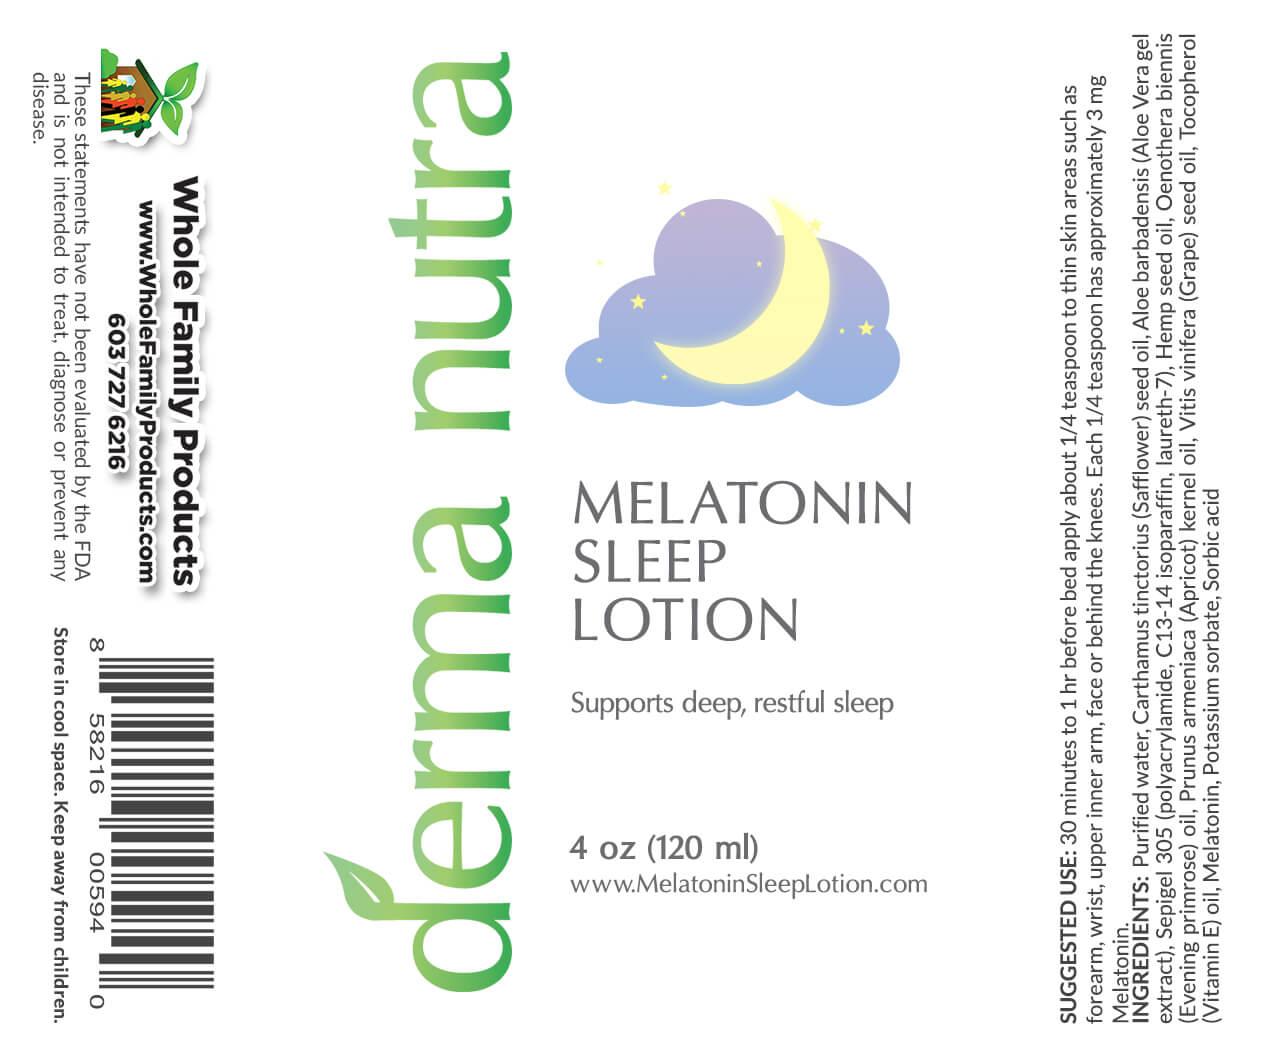 Derma Nutra Melatonin Sleep Lotion 4oz Pump Product Label